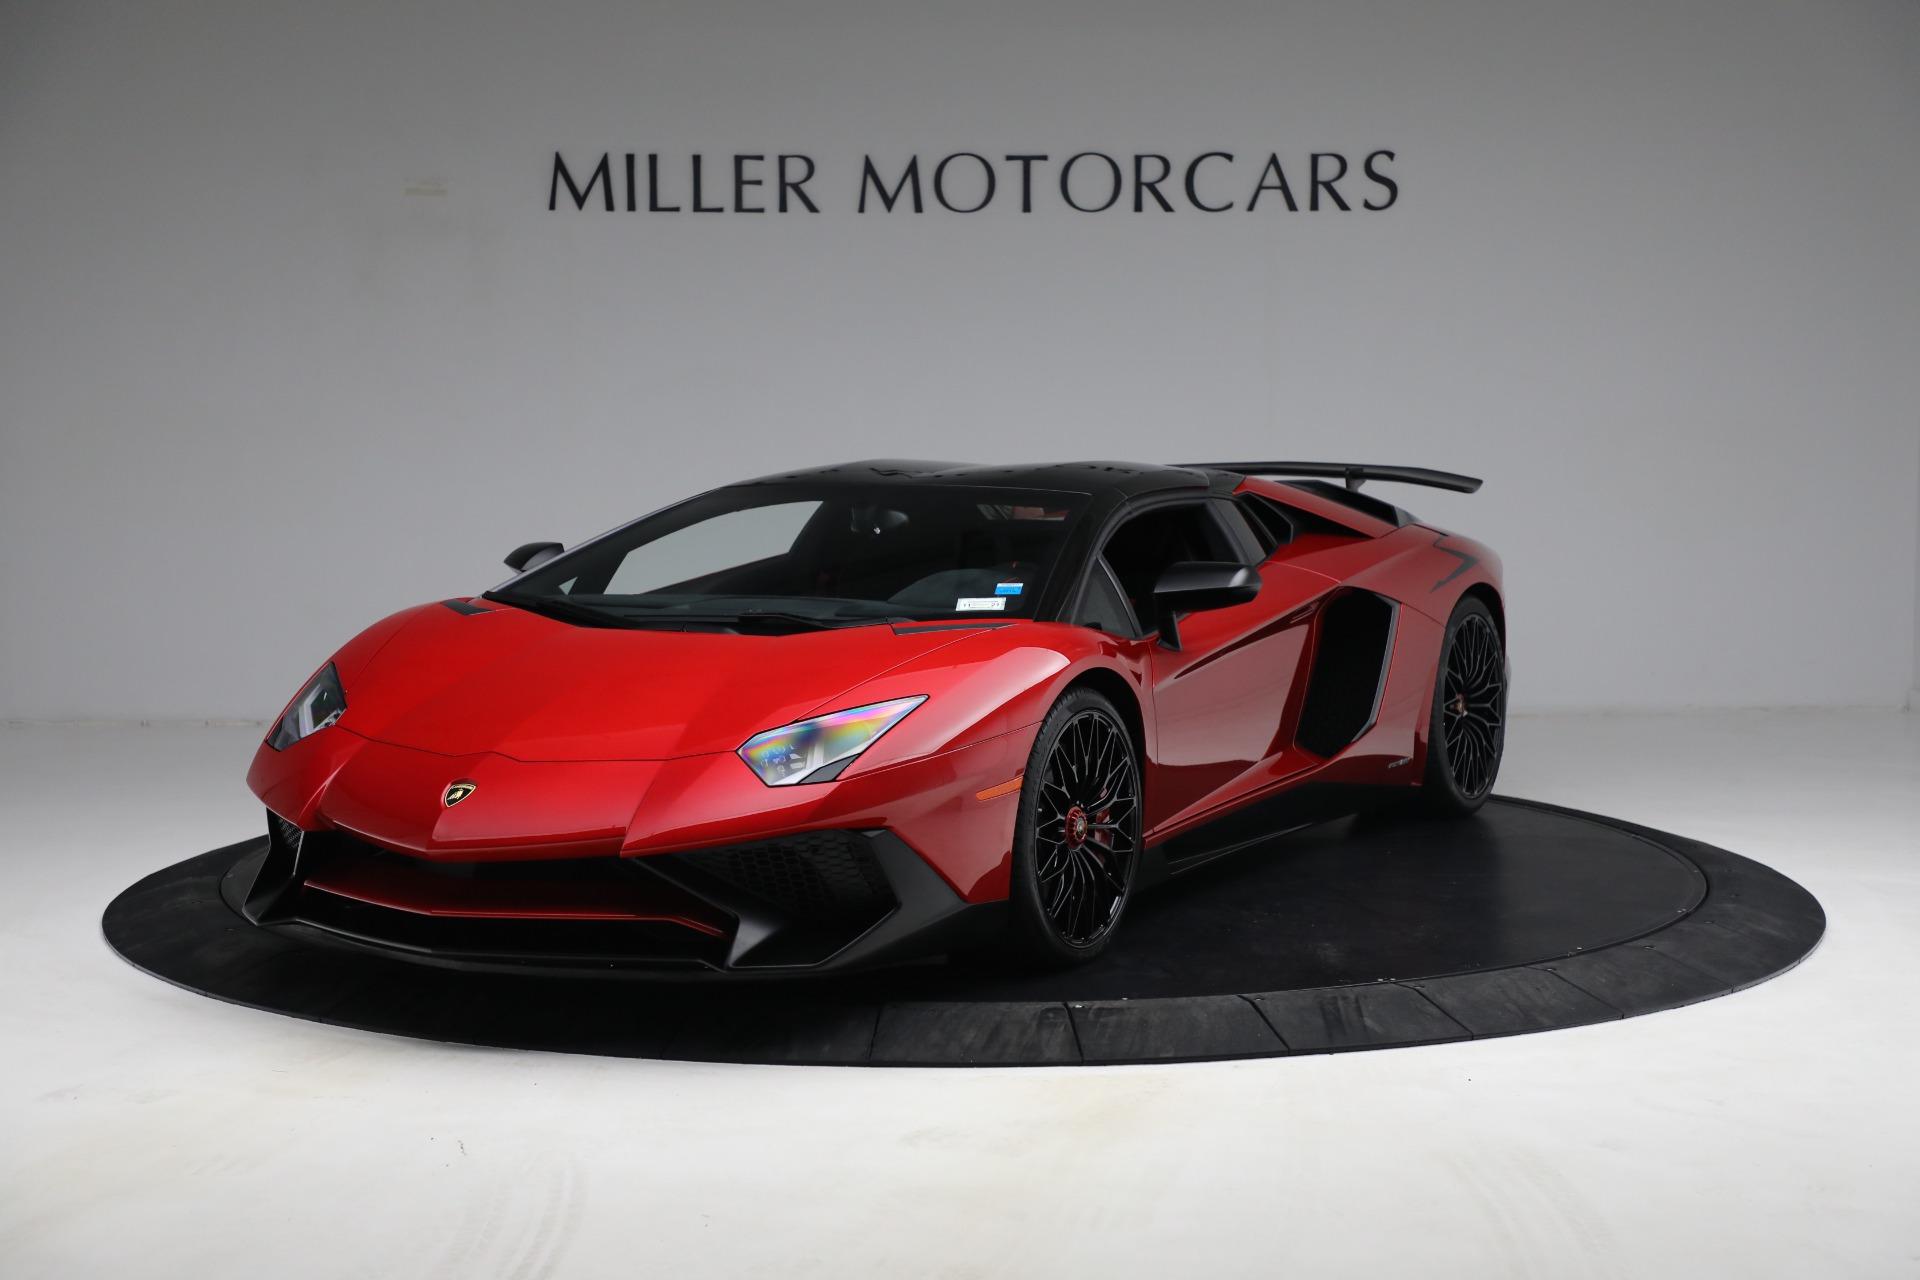 Used 2017 Lamborghini Aventador LP 750 4 SV